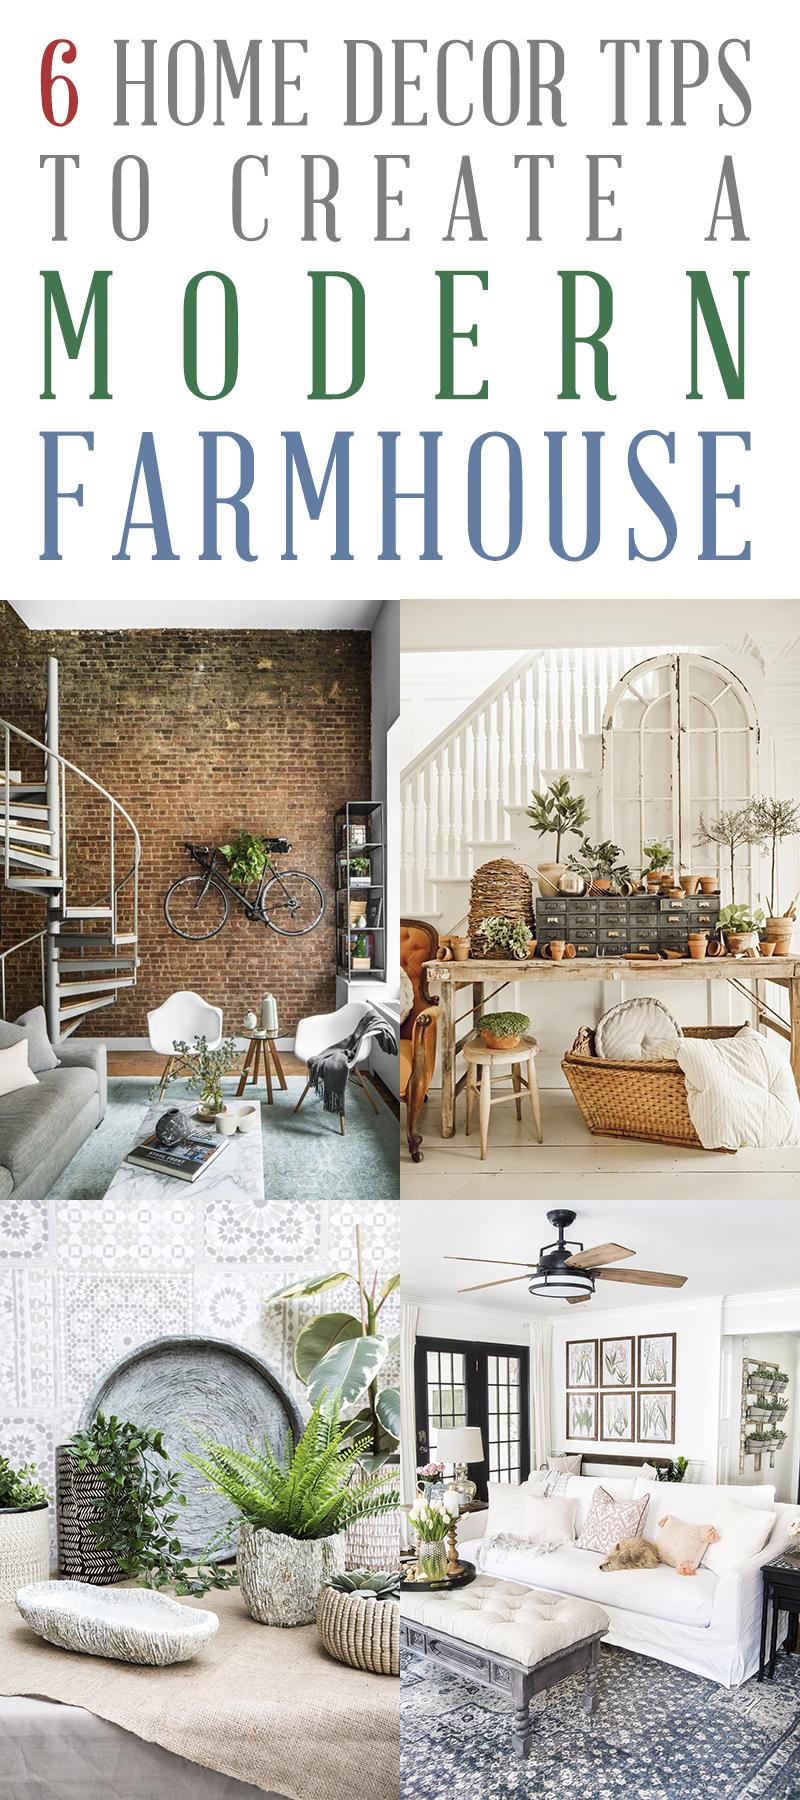 6 Home Decor Tips to Create a Modern Farmhouse